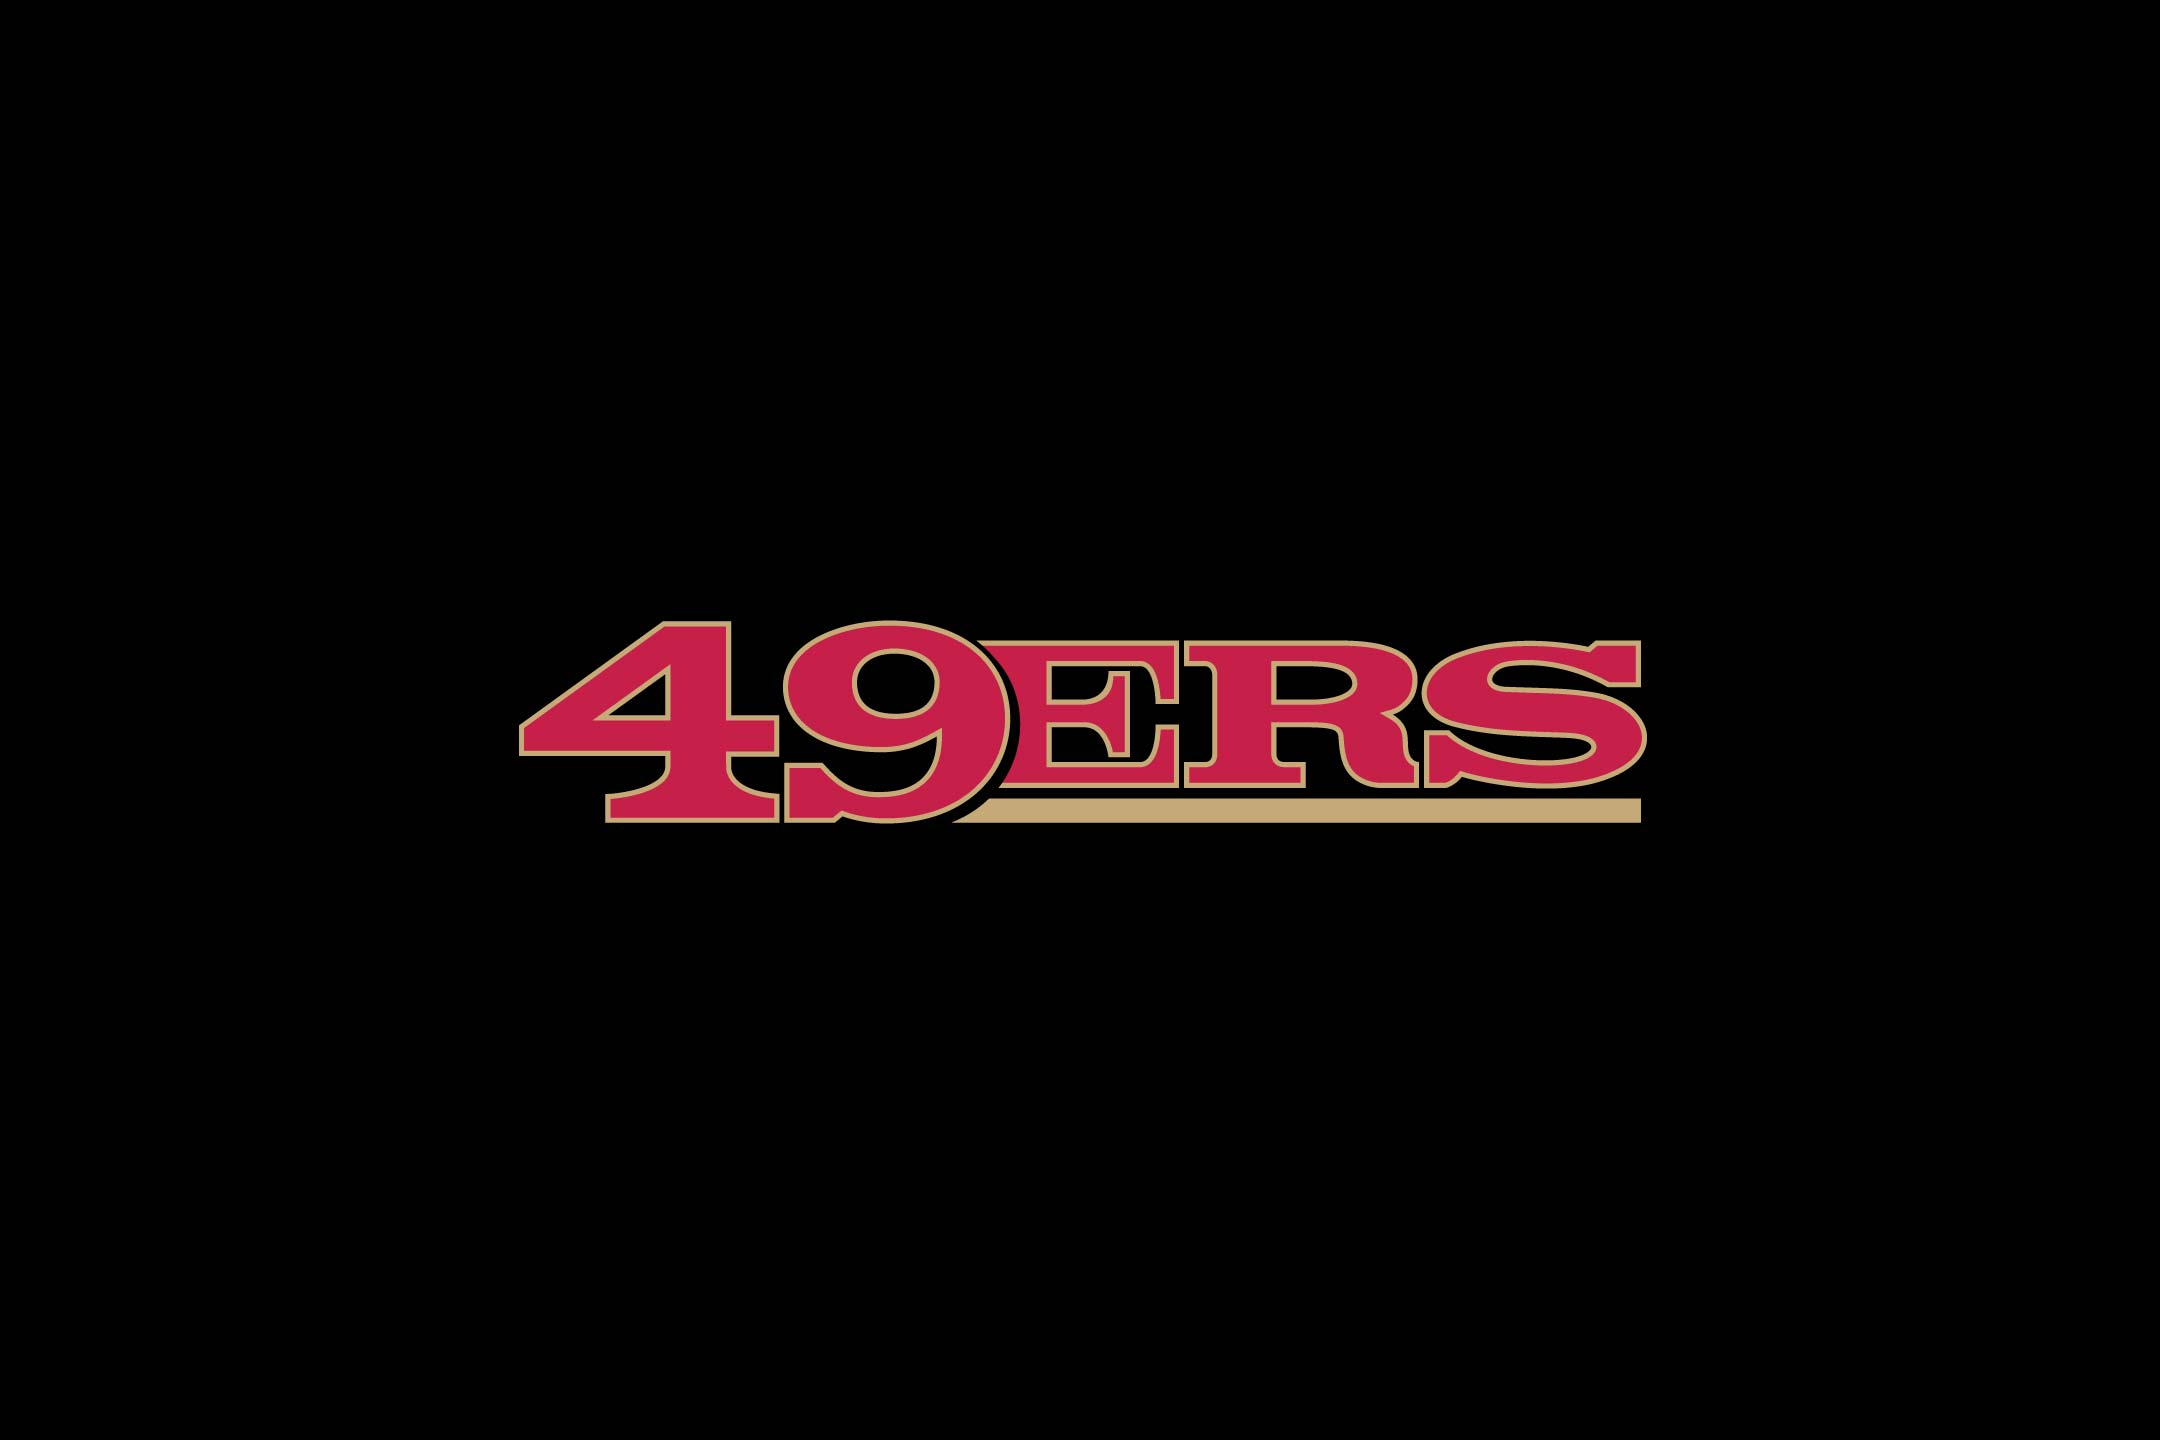 Nfl Wallpaper Hd 49ers San francisco 49ers nfl 2160x1440